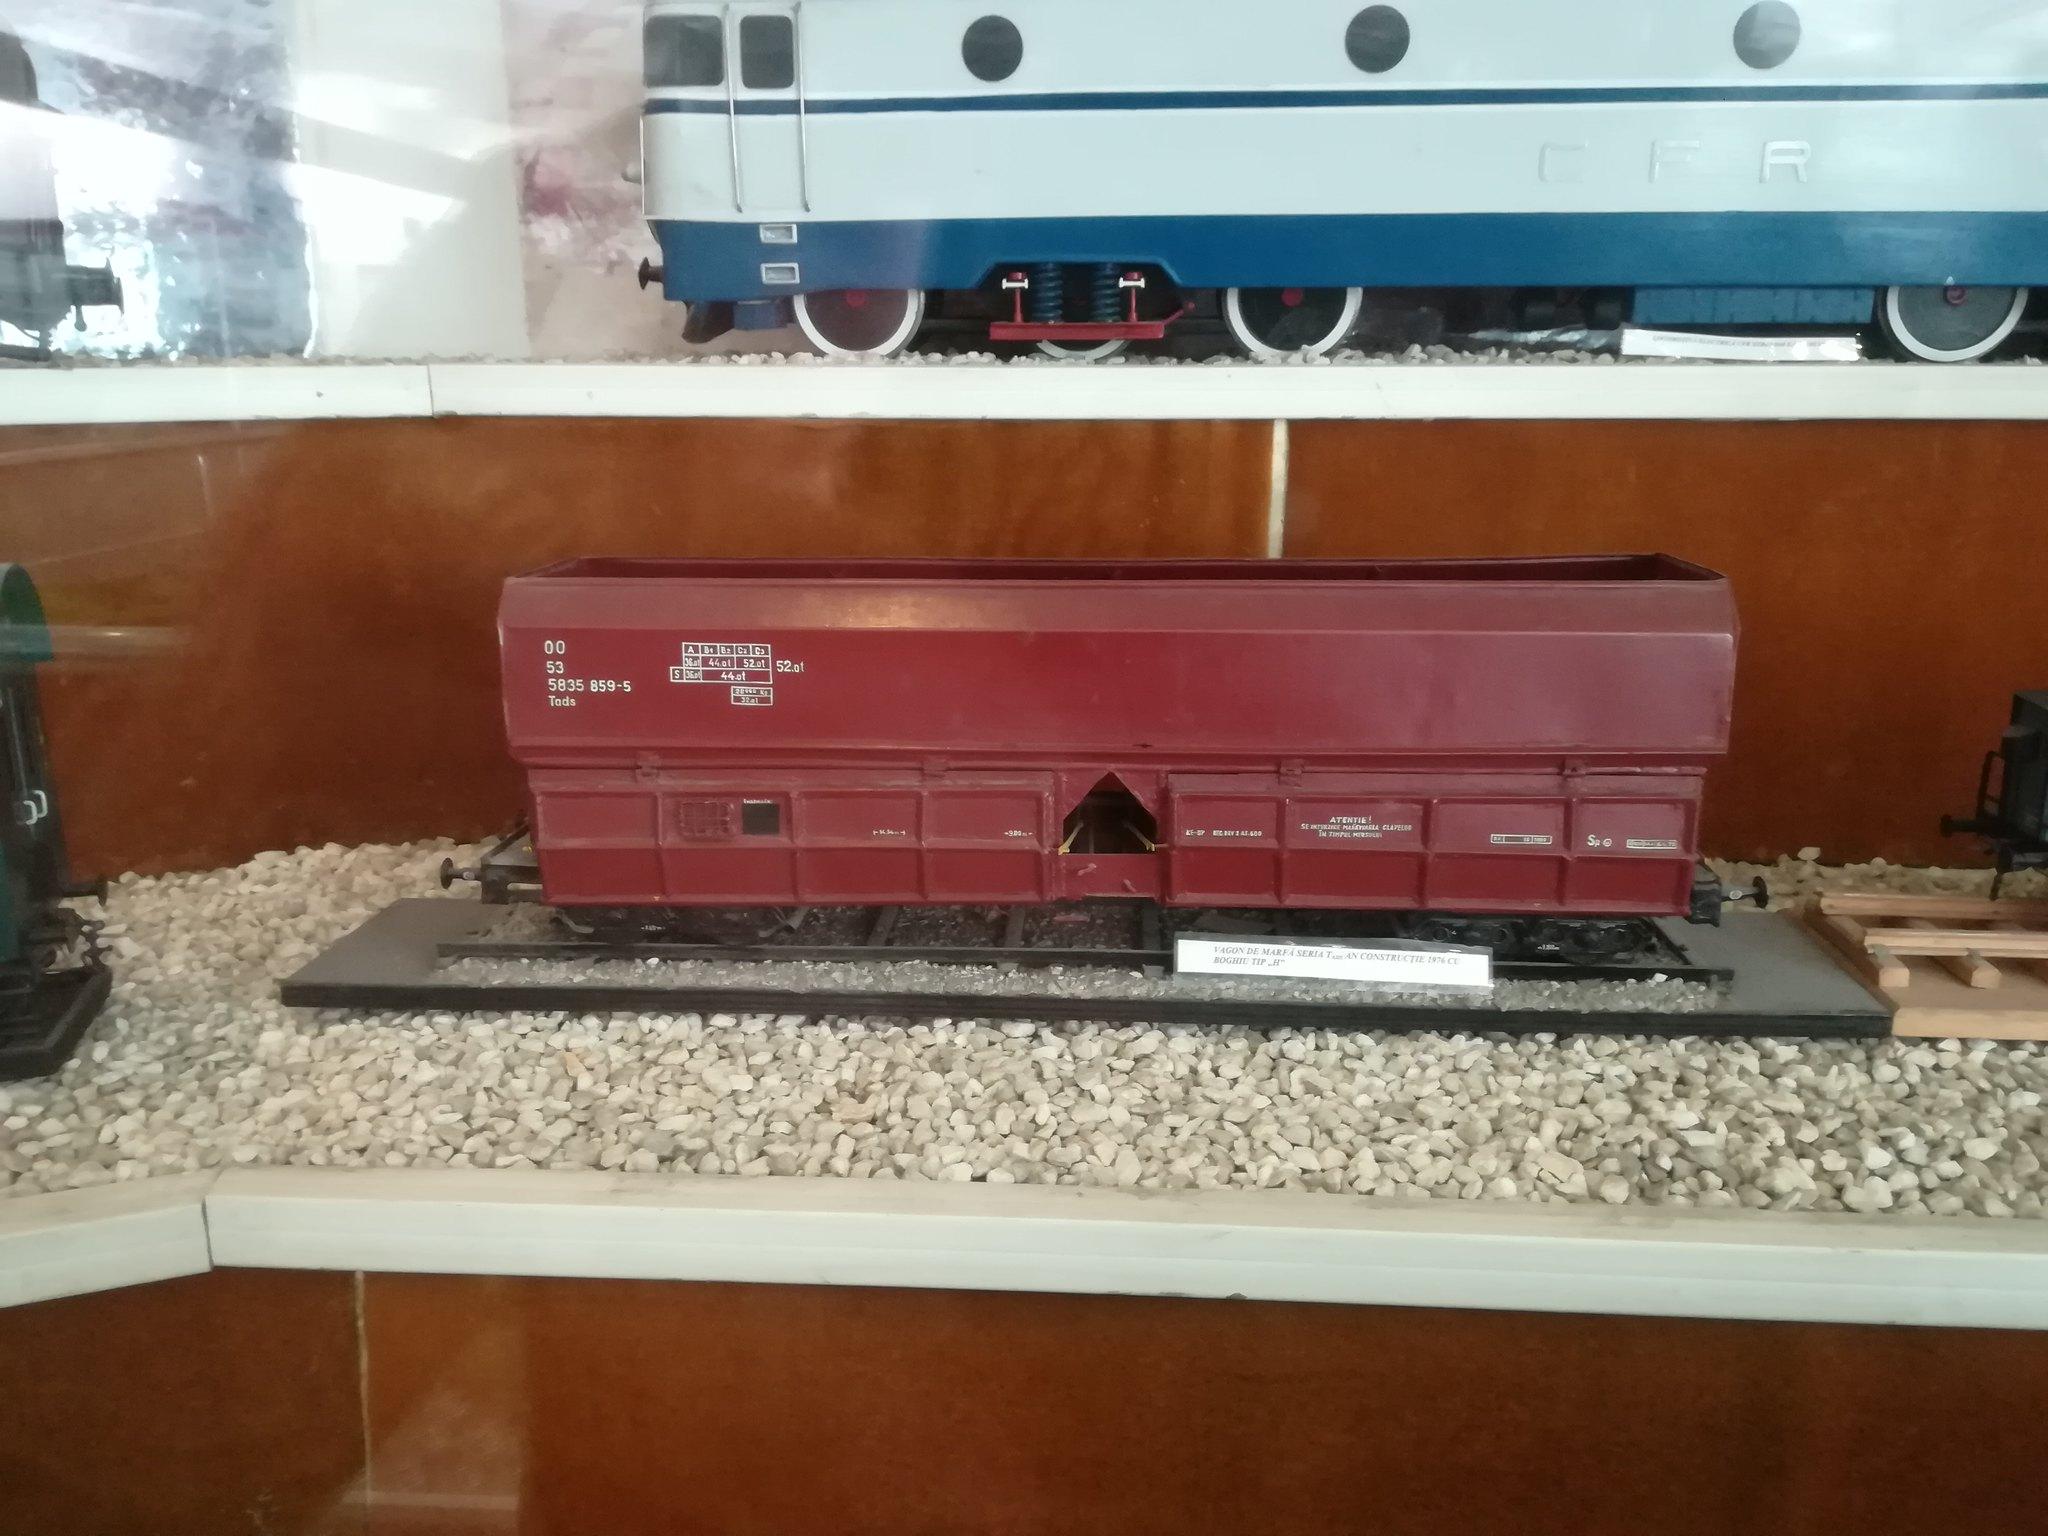 Reportaje feroviare Adirmvl - Pagina 21 49597099837_8a13c5d623_k